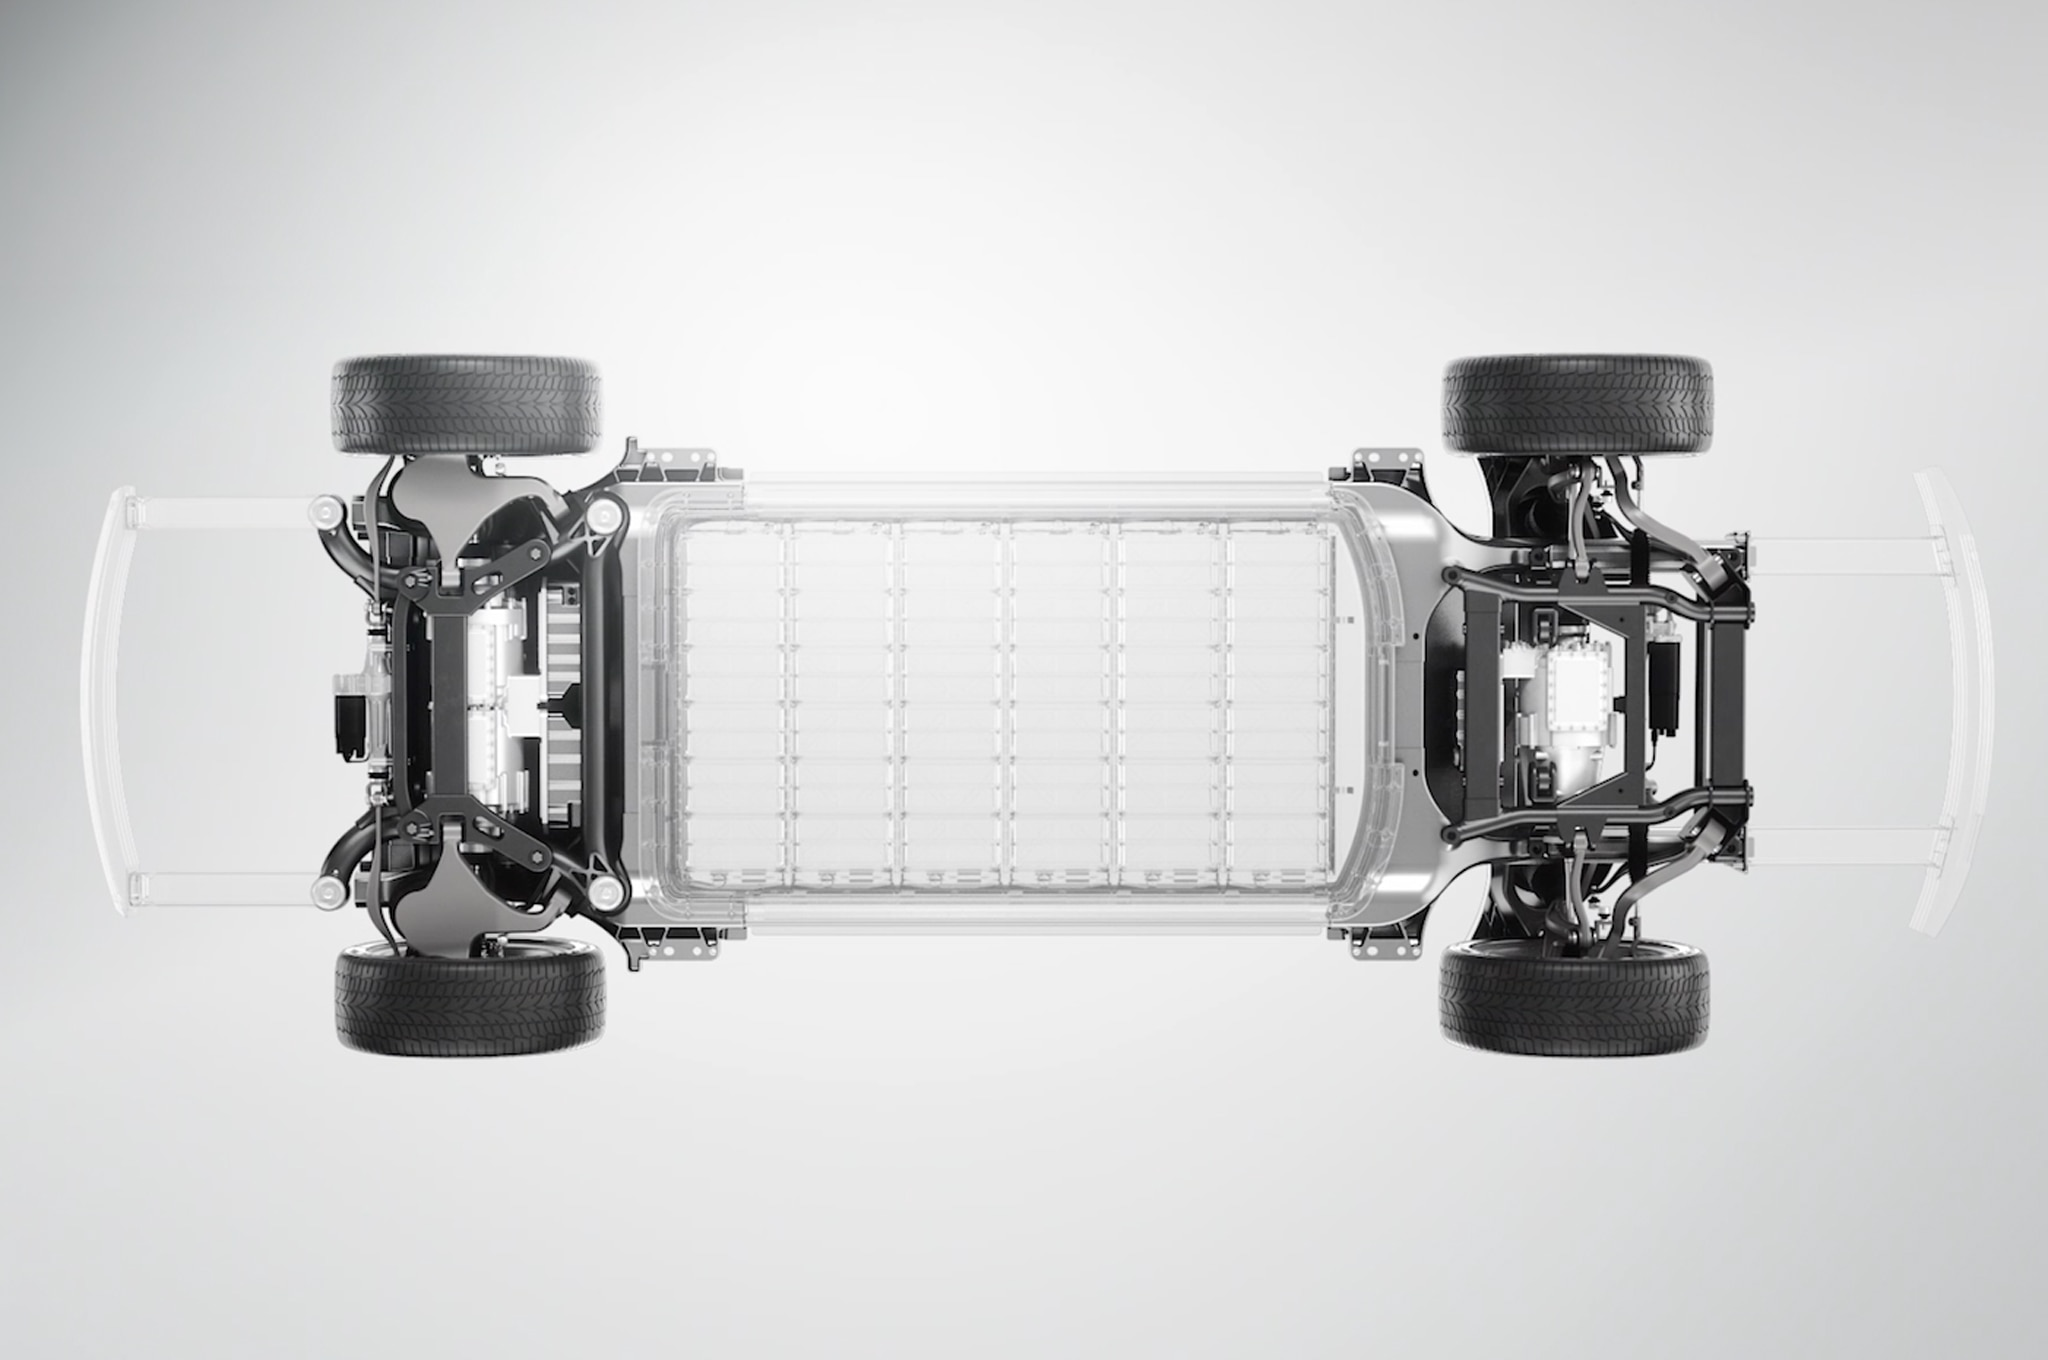 Alfa Romeo Los Angeles >> Faraday Future Claims Highest Energy Density for LG Chem ...